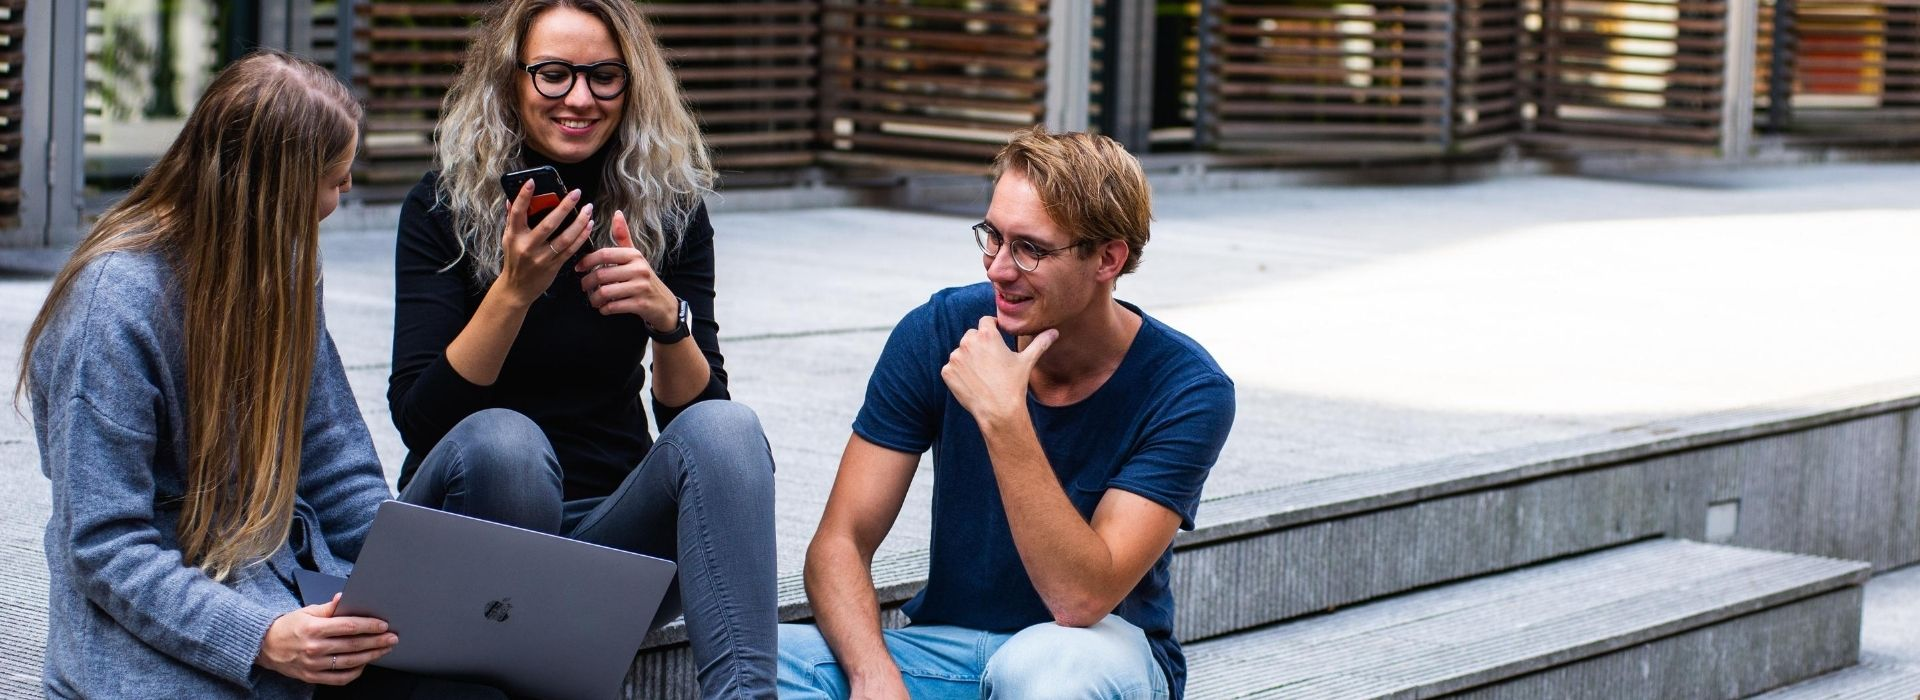 students at Cyprus university